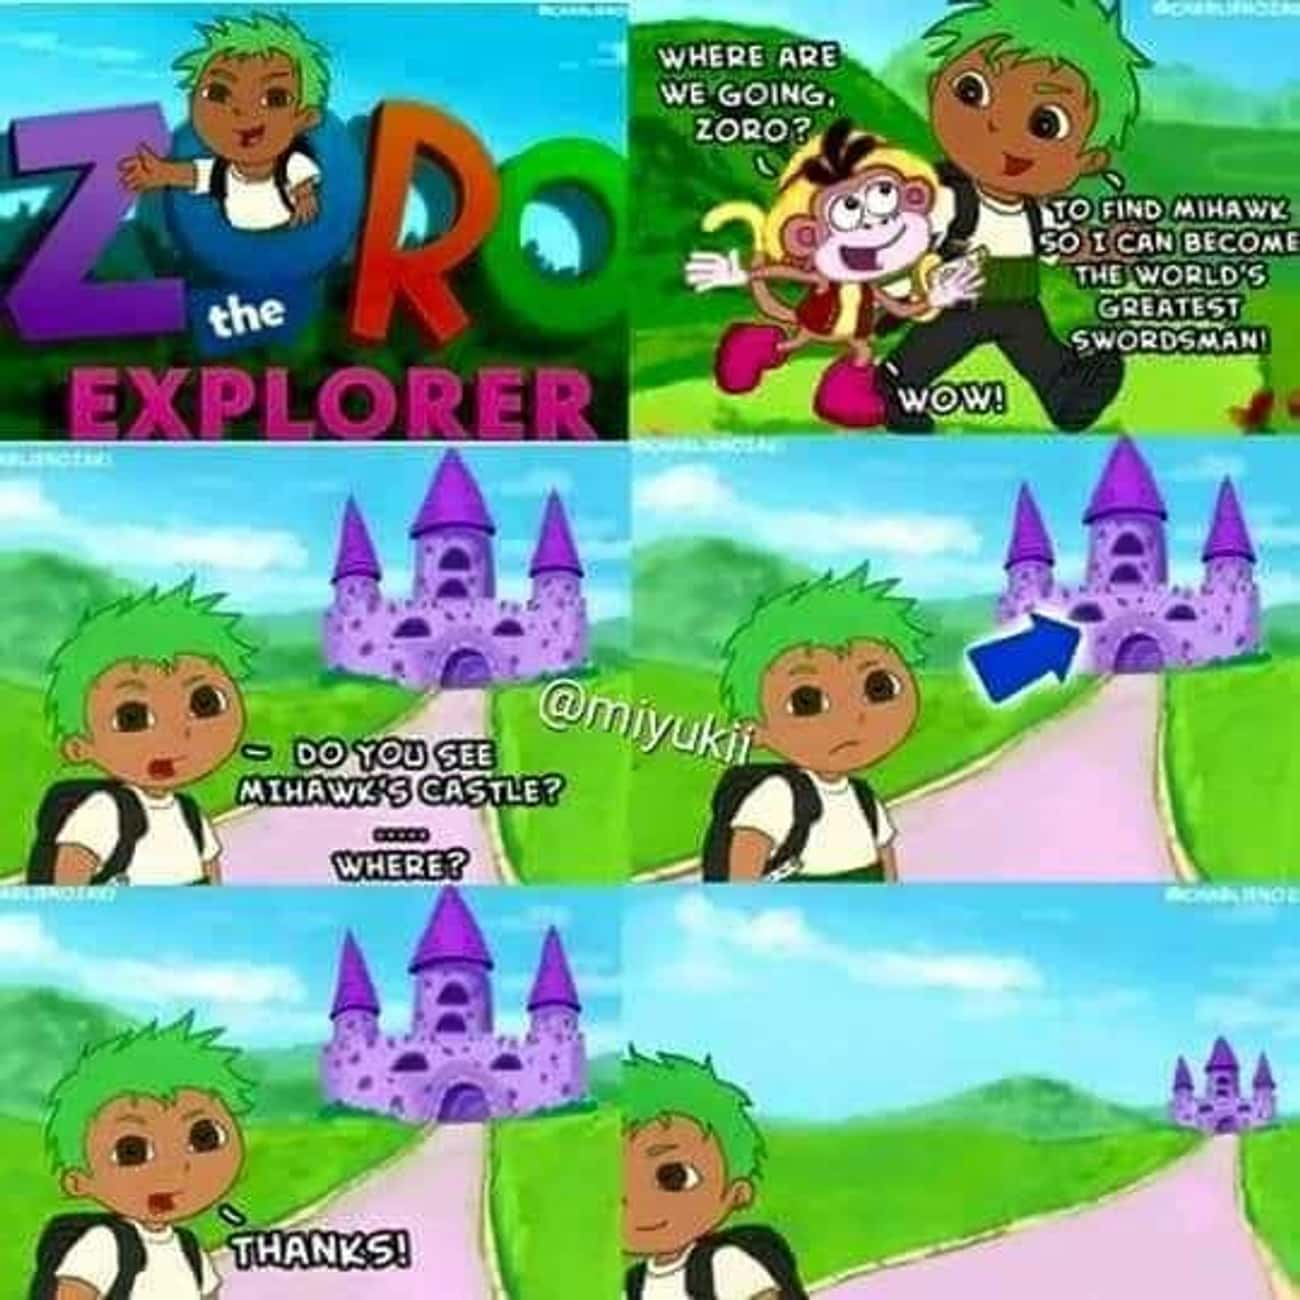 Zoro The Explorer